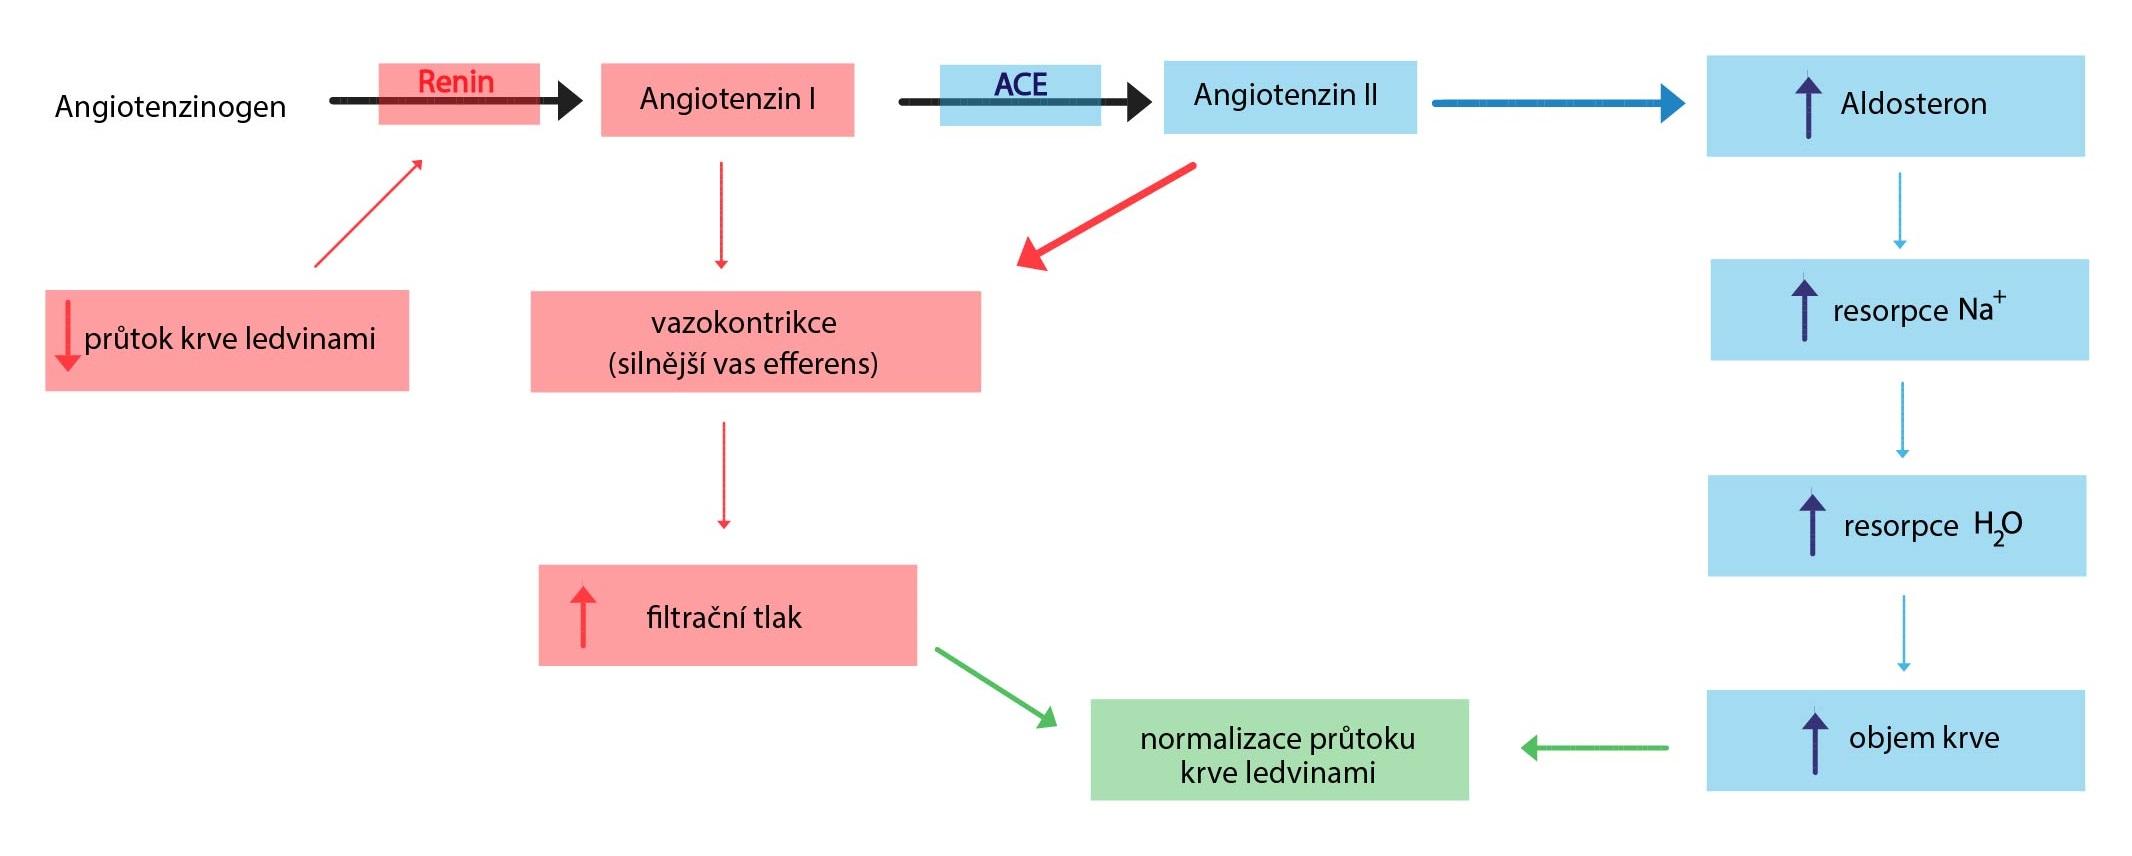 renin-angiotenzin-aldosteron-01